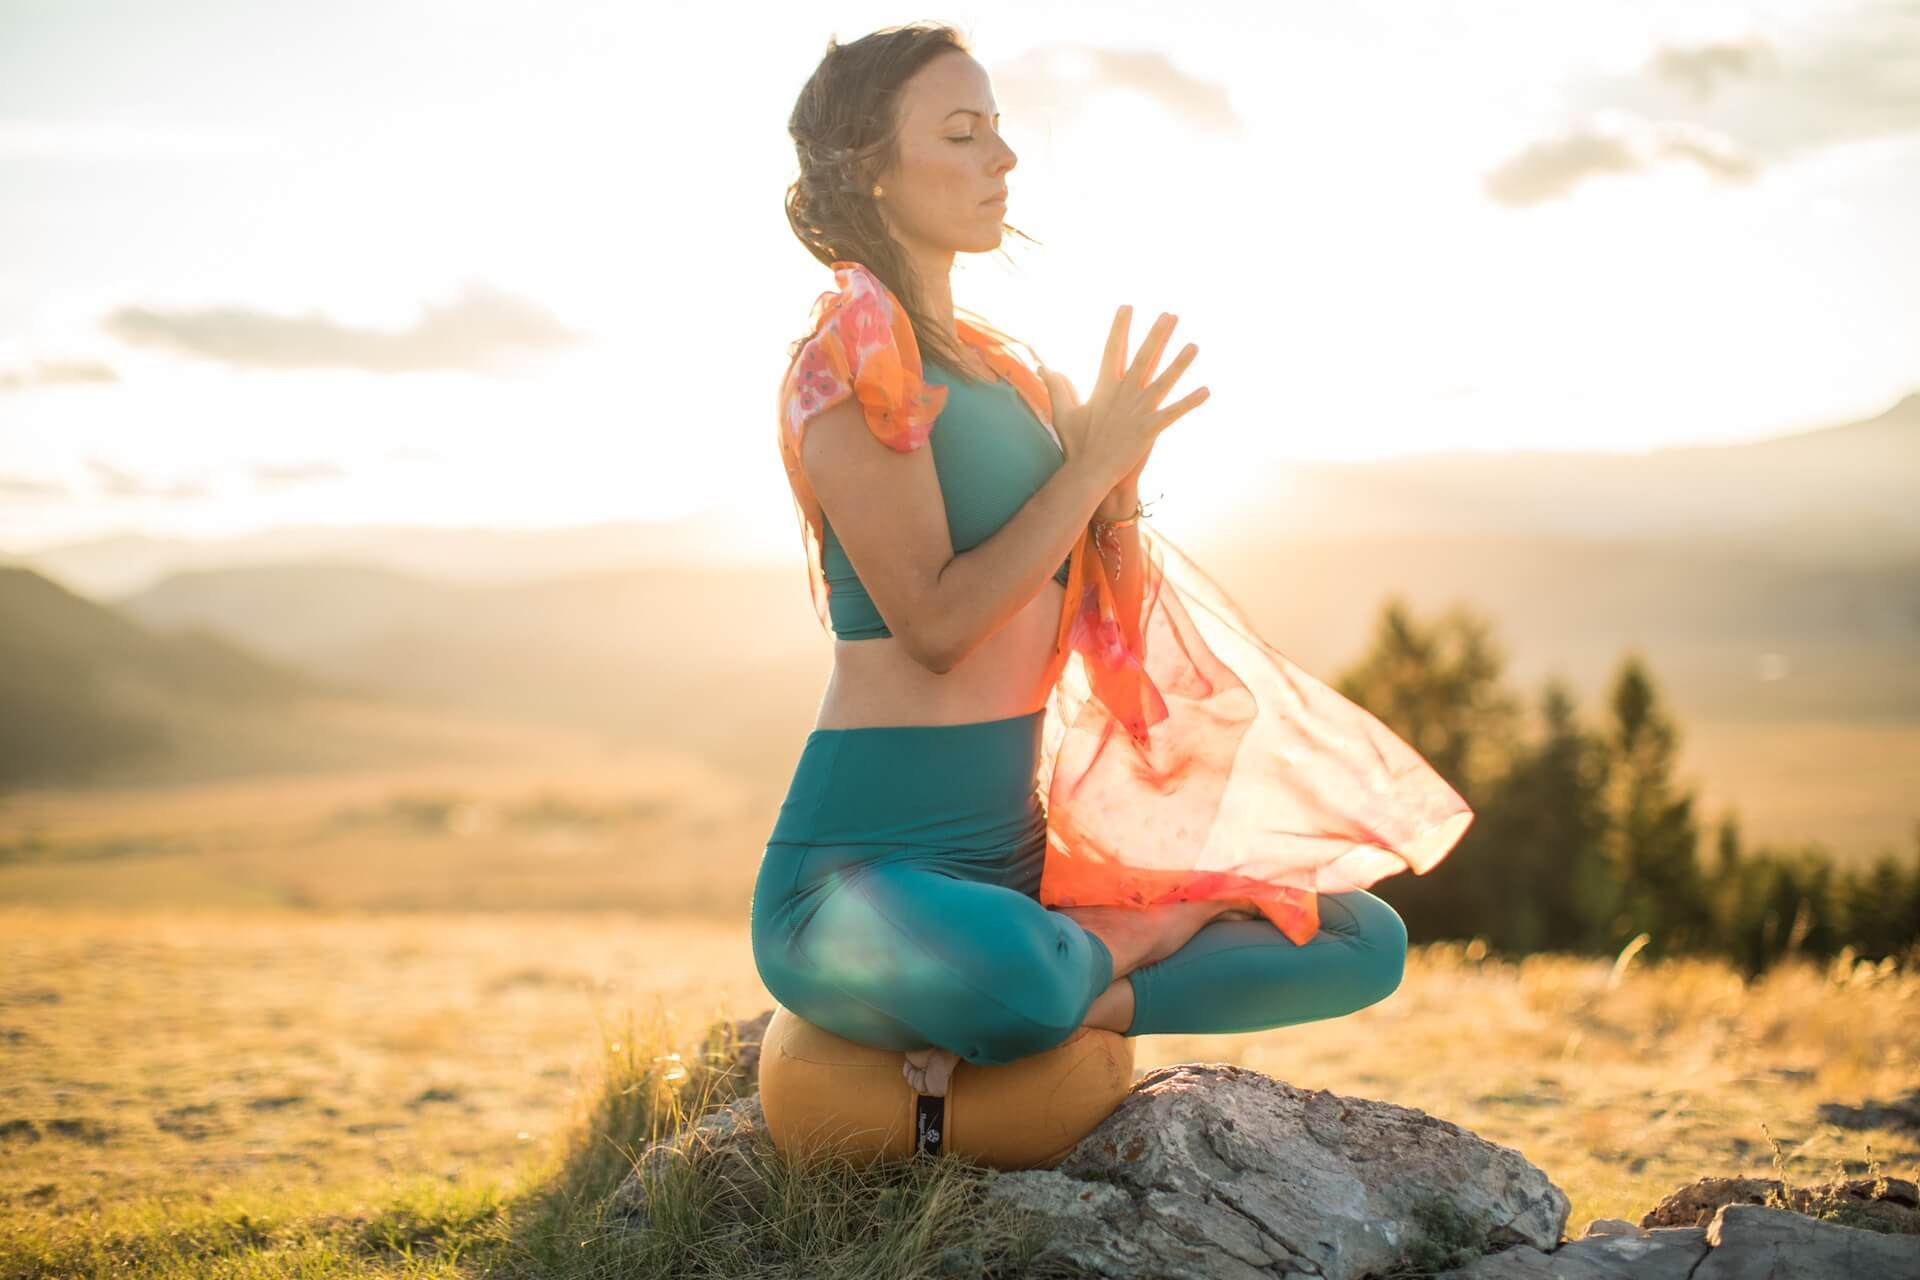 LUXURY CARDが大自然の映像を背景に自宅でヨガを楽しめる「YogaToday」を会員向けに3ヶ月間無料開放 lf200402_yogatoday_03-1